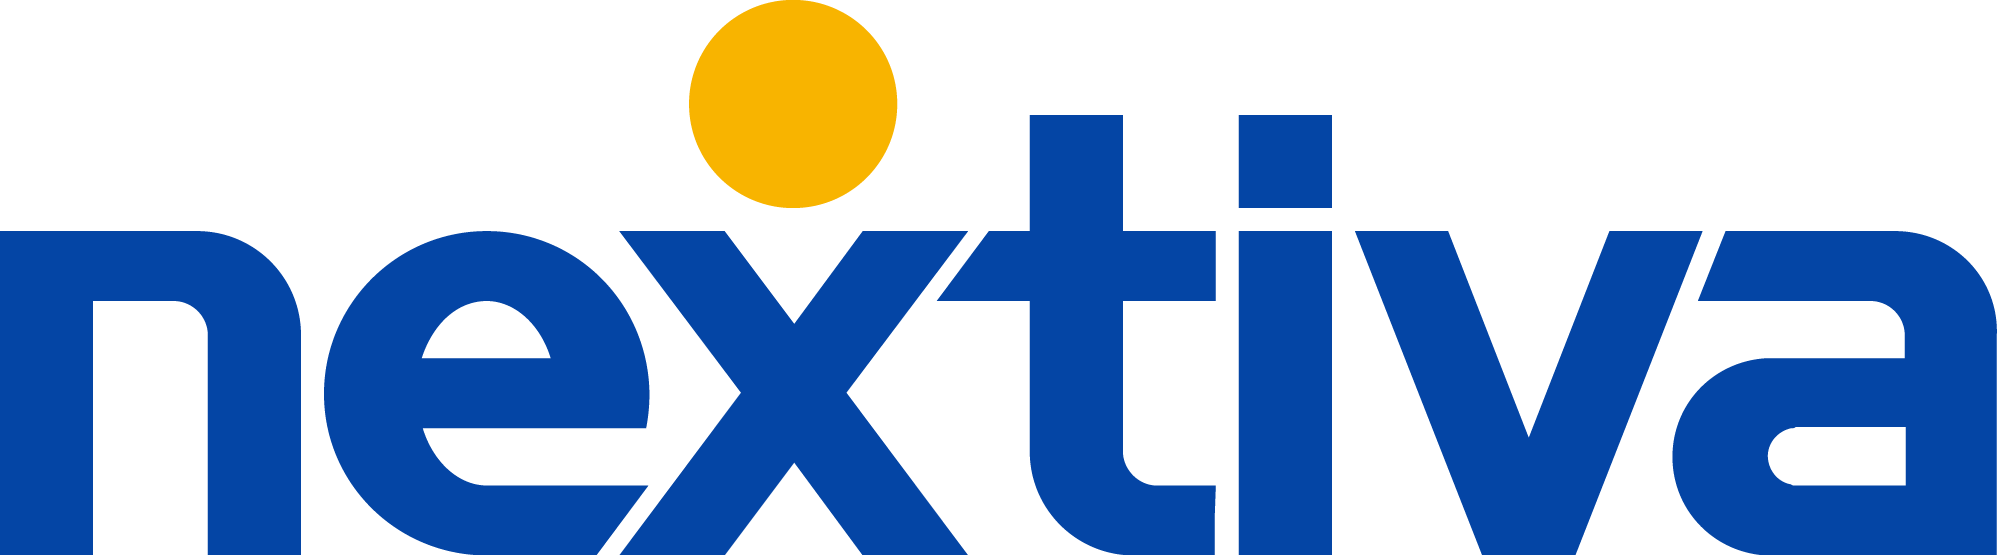 Logotipo de Nextiva